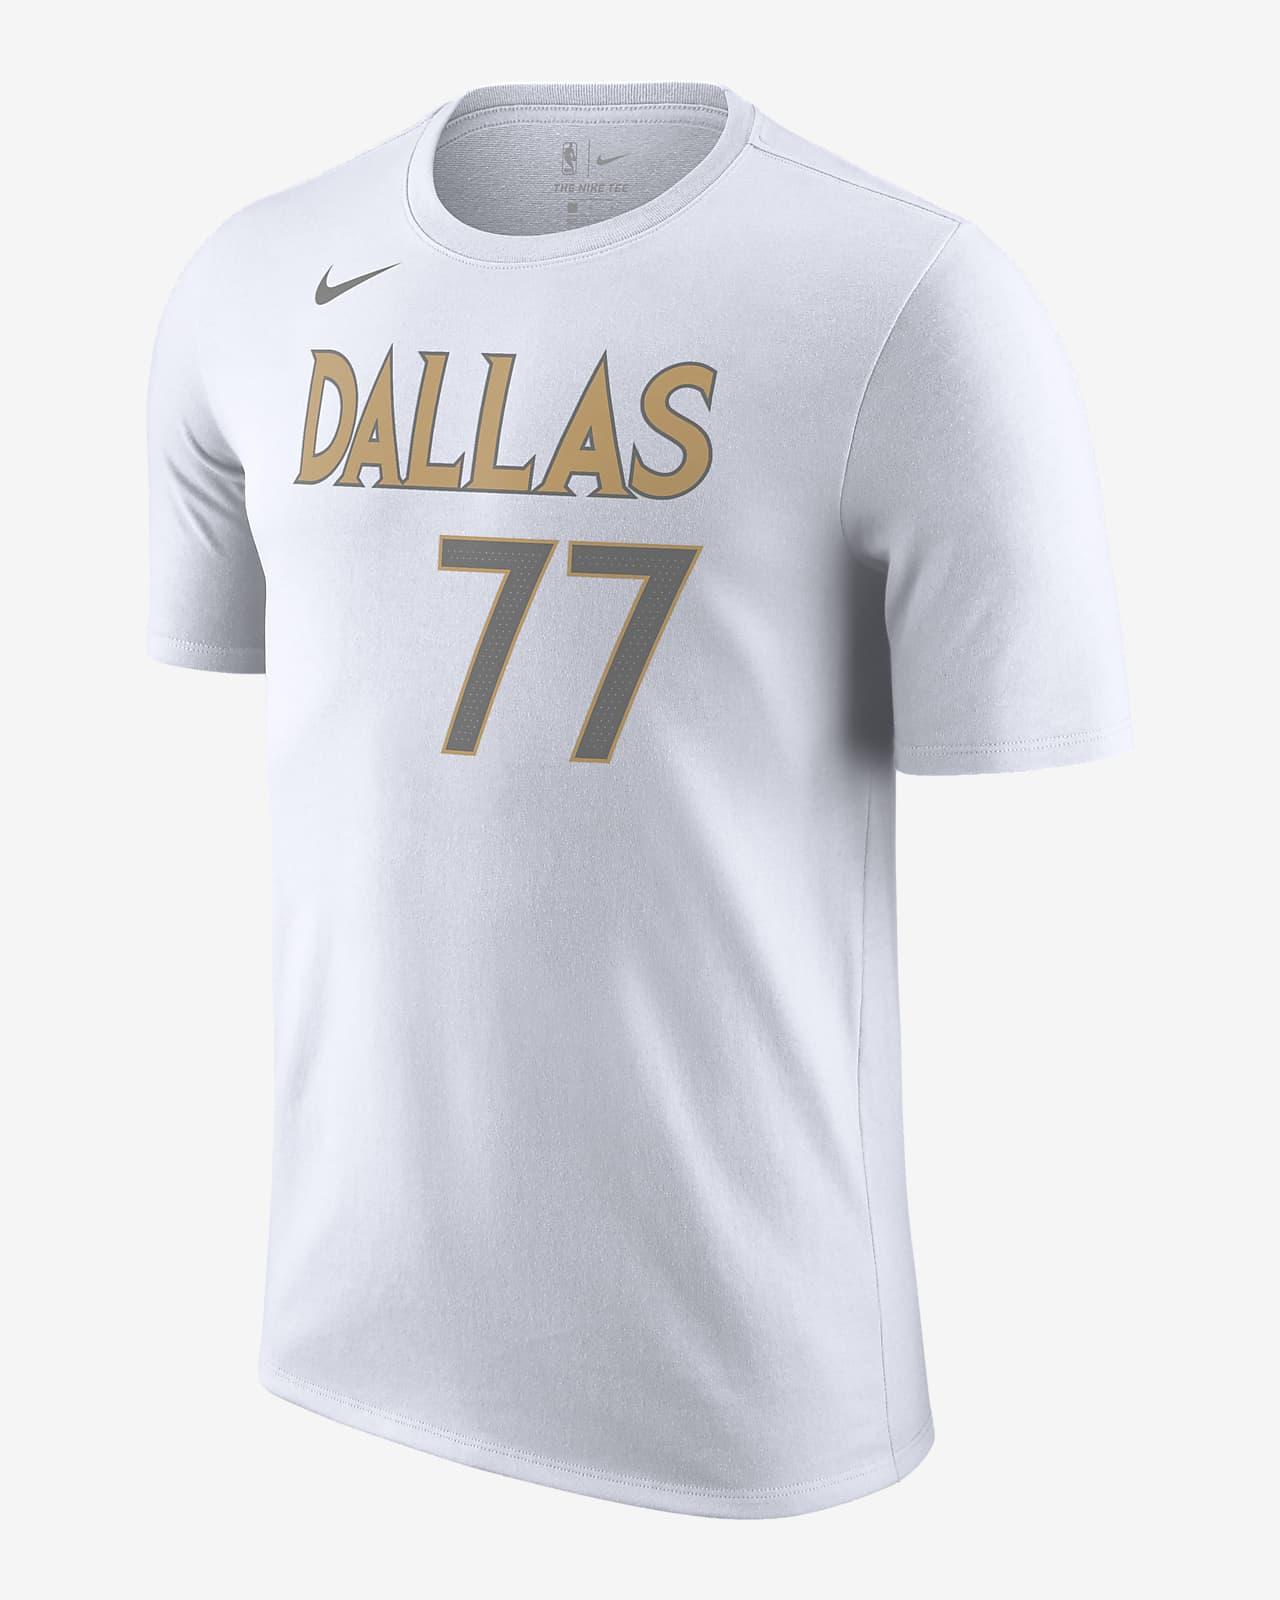 Playera Nike NBA para hombre Dallas Mavericks City Edition